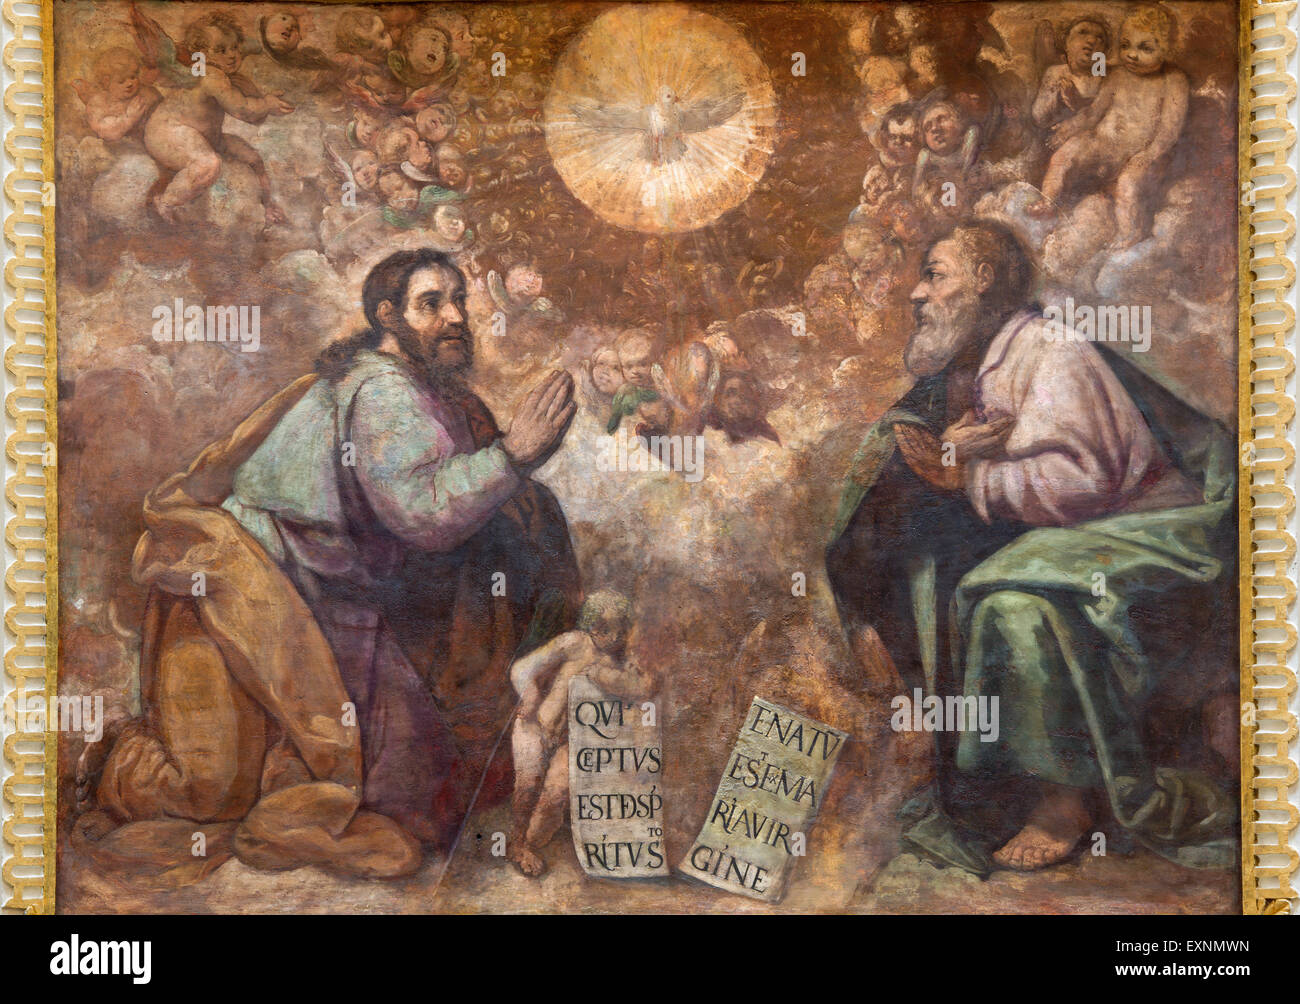 CORDOBA, SPAIN - MAY 27, 2015: The renaissance fresco of Holy Trinity in church Iglesia de San Lorenzo from 15. - Stock Image